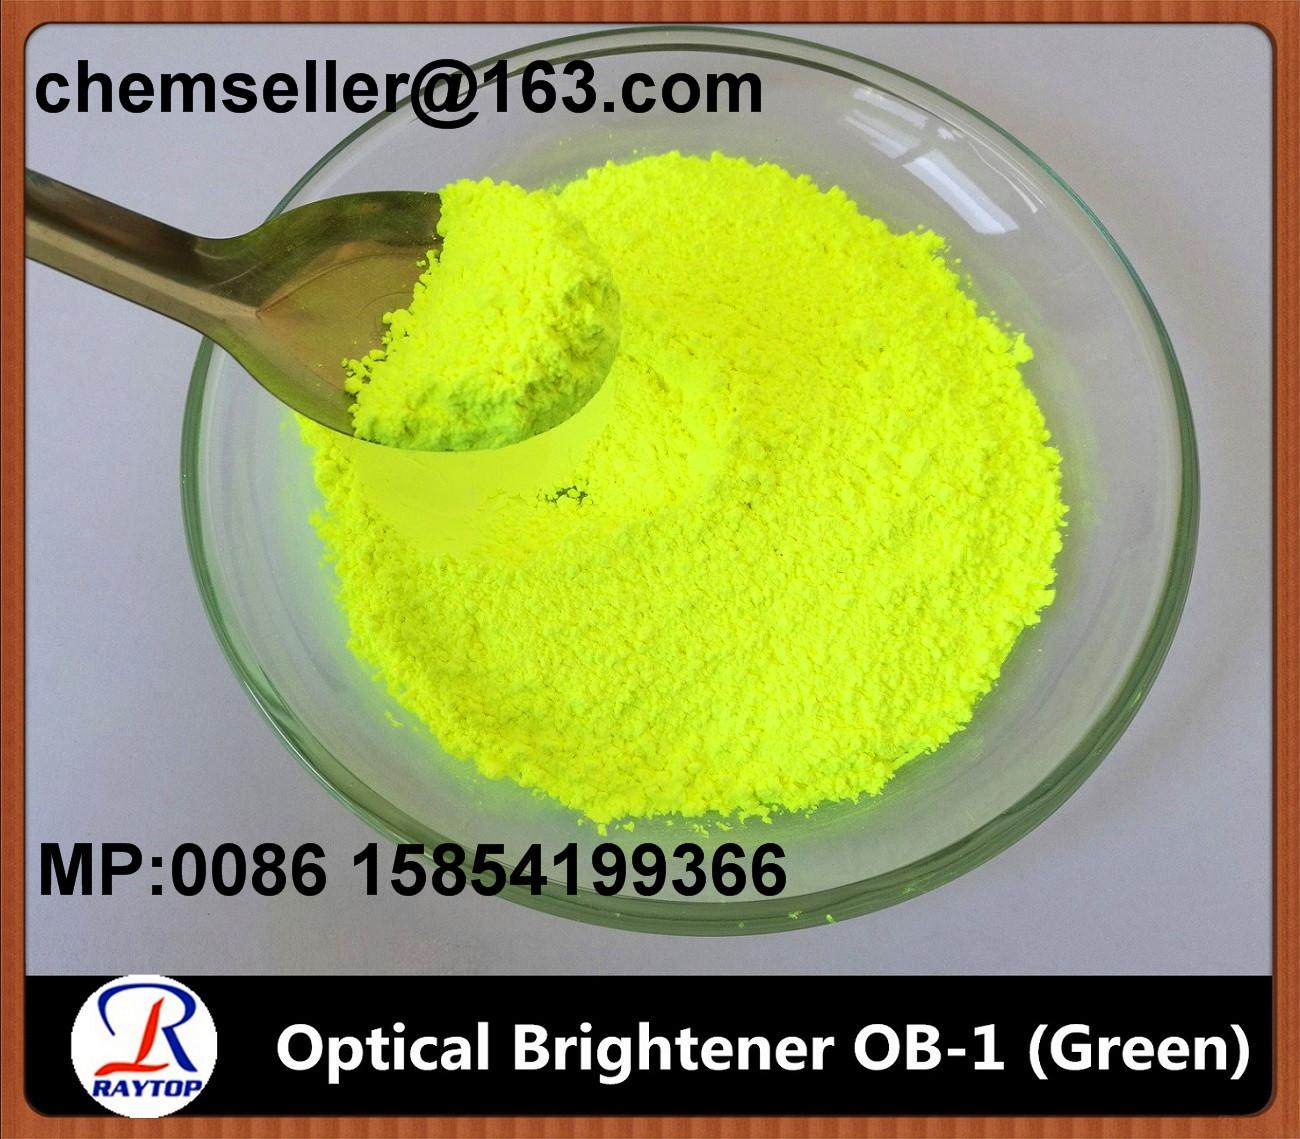 Fluorescent Brightener OB-1 CAS NO 1533-45-5 used for PVC plastics